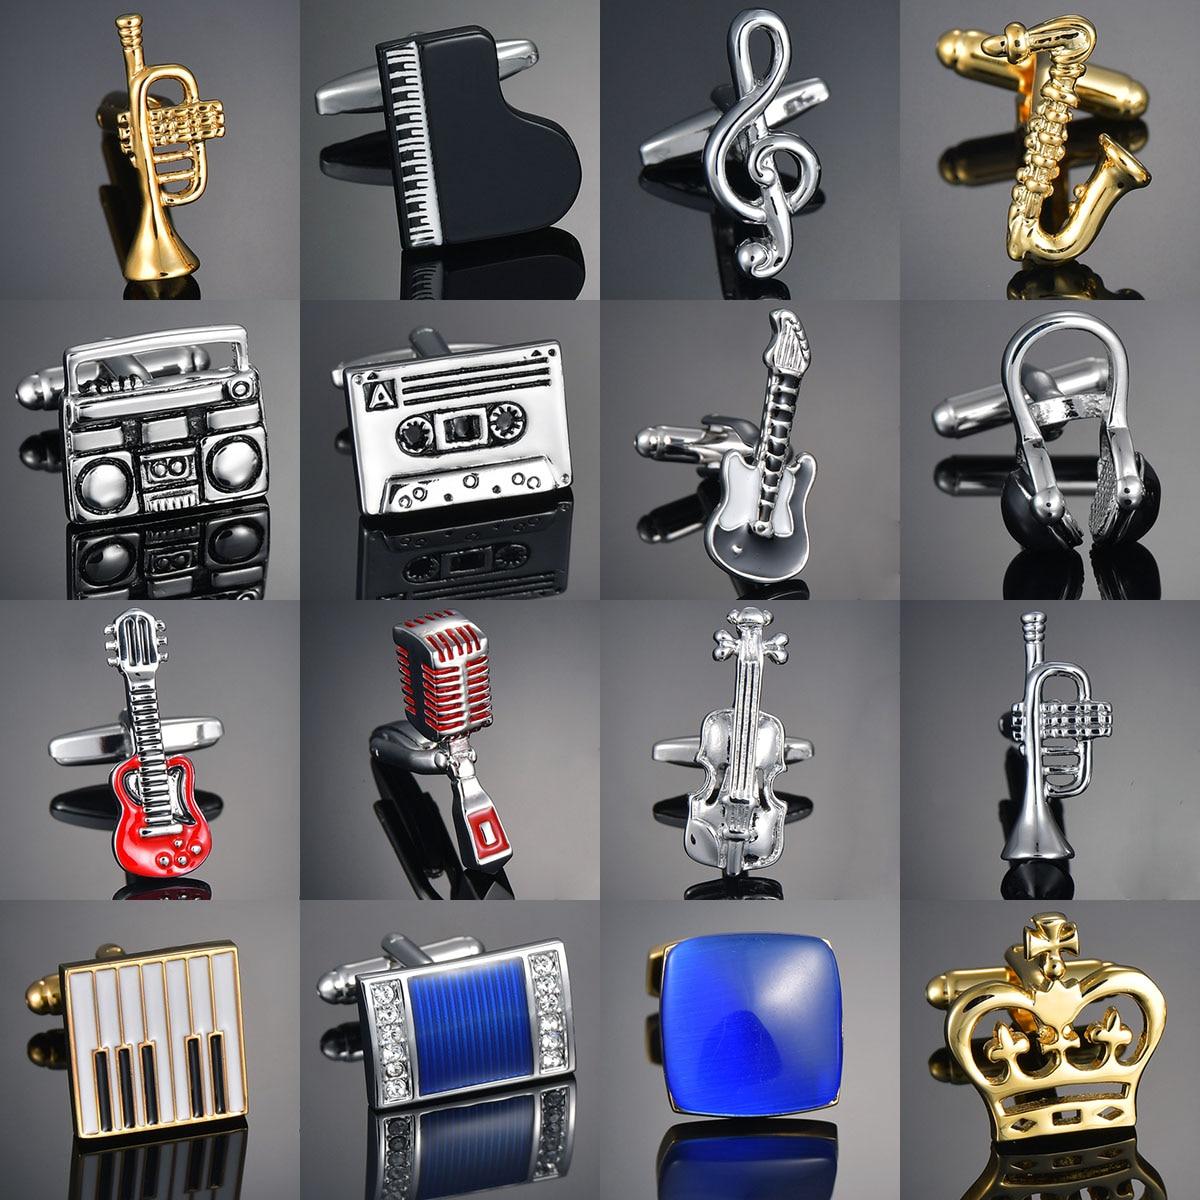 Guitar/Music Note/Recorder/Microphone/Trumpet Cufflinks Music Design Musical Note Cuff Links Piano Bass Cuffs Gemelos Bouton Man